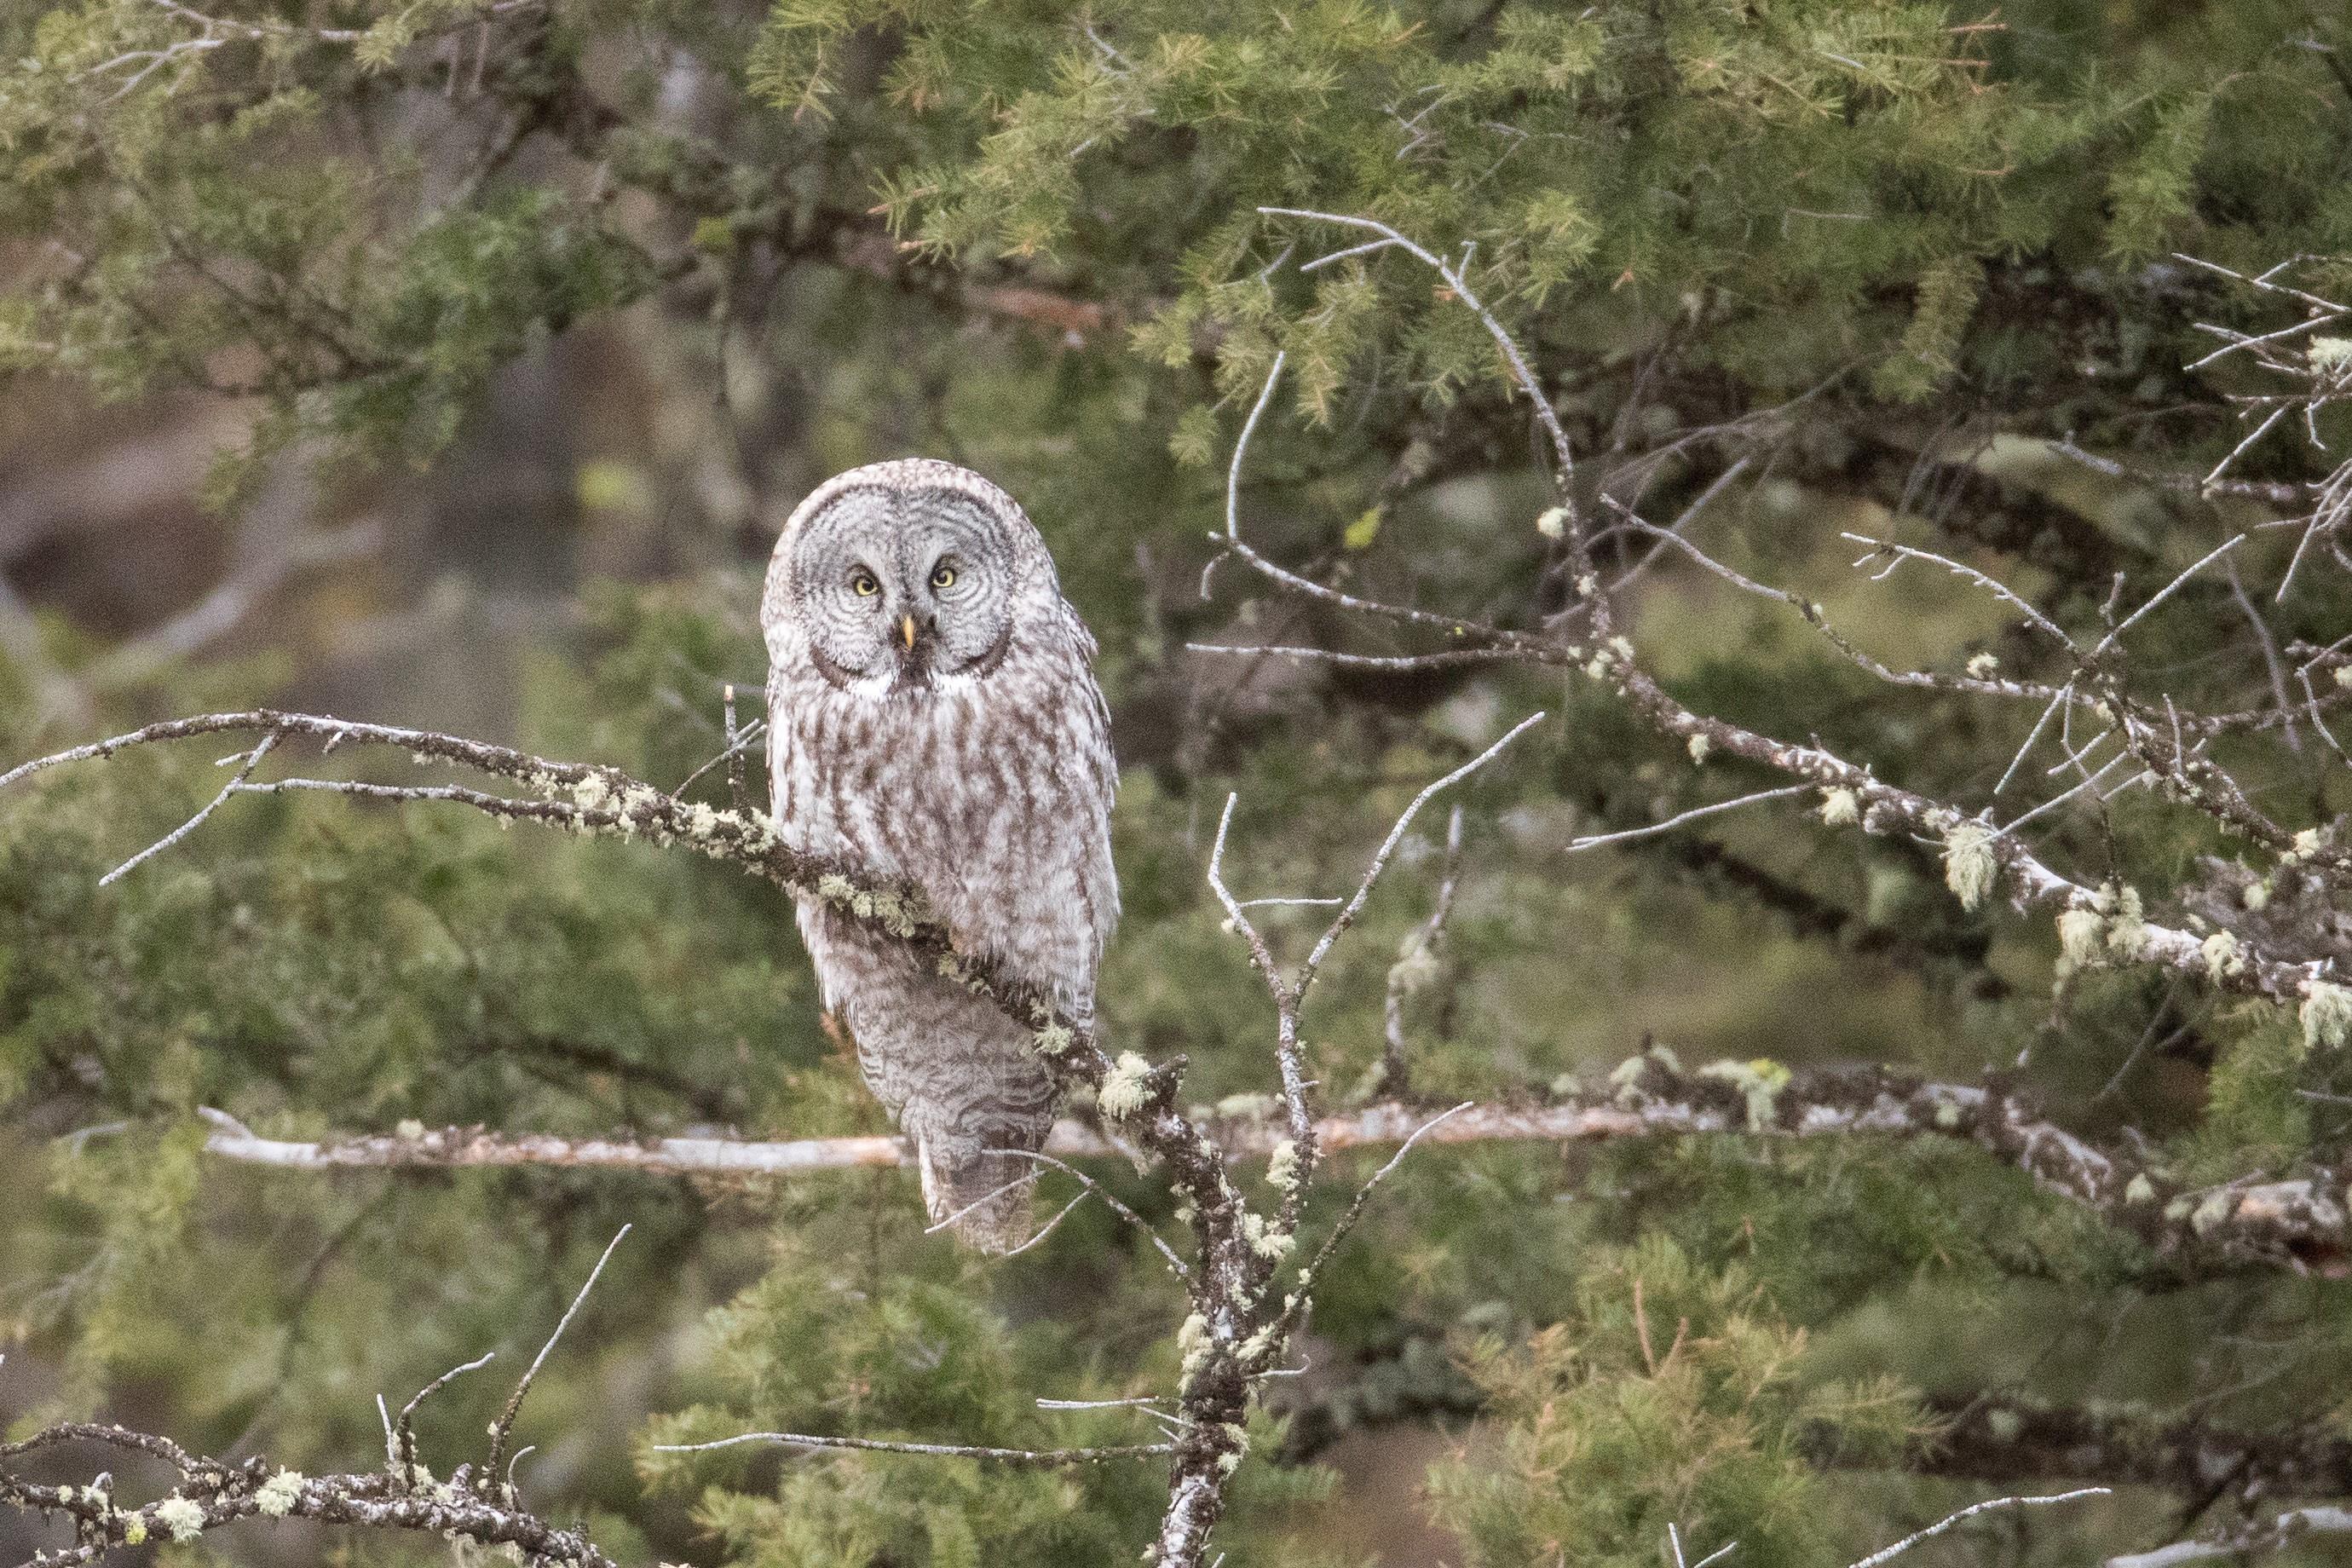 Grey owl on a tree branch